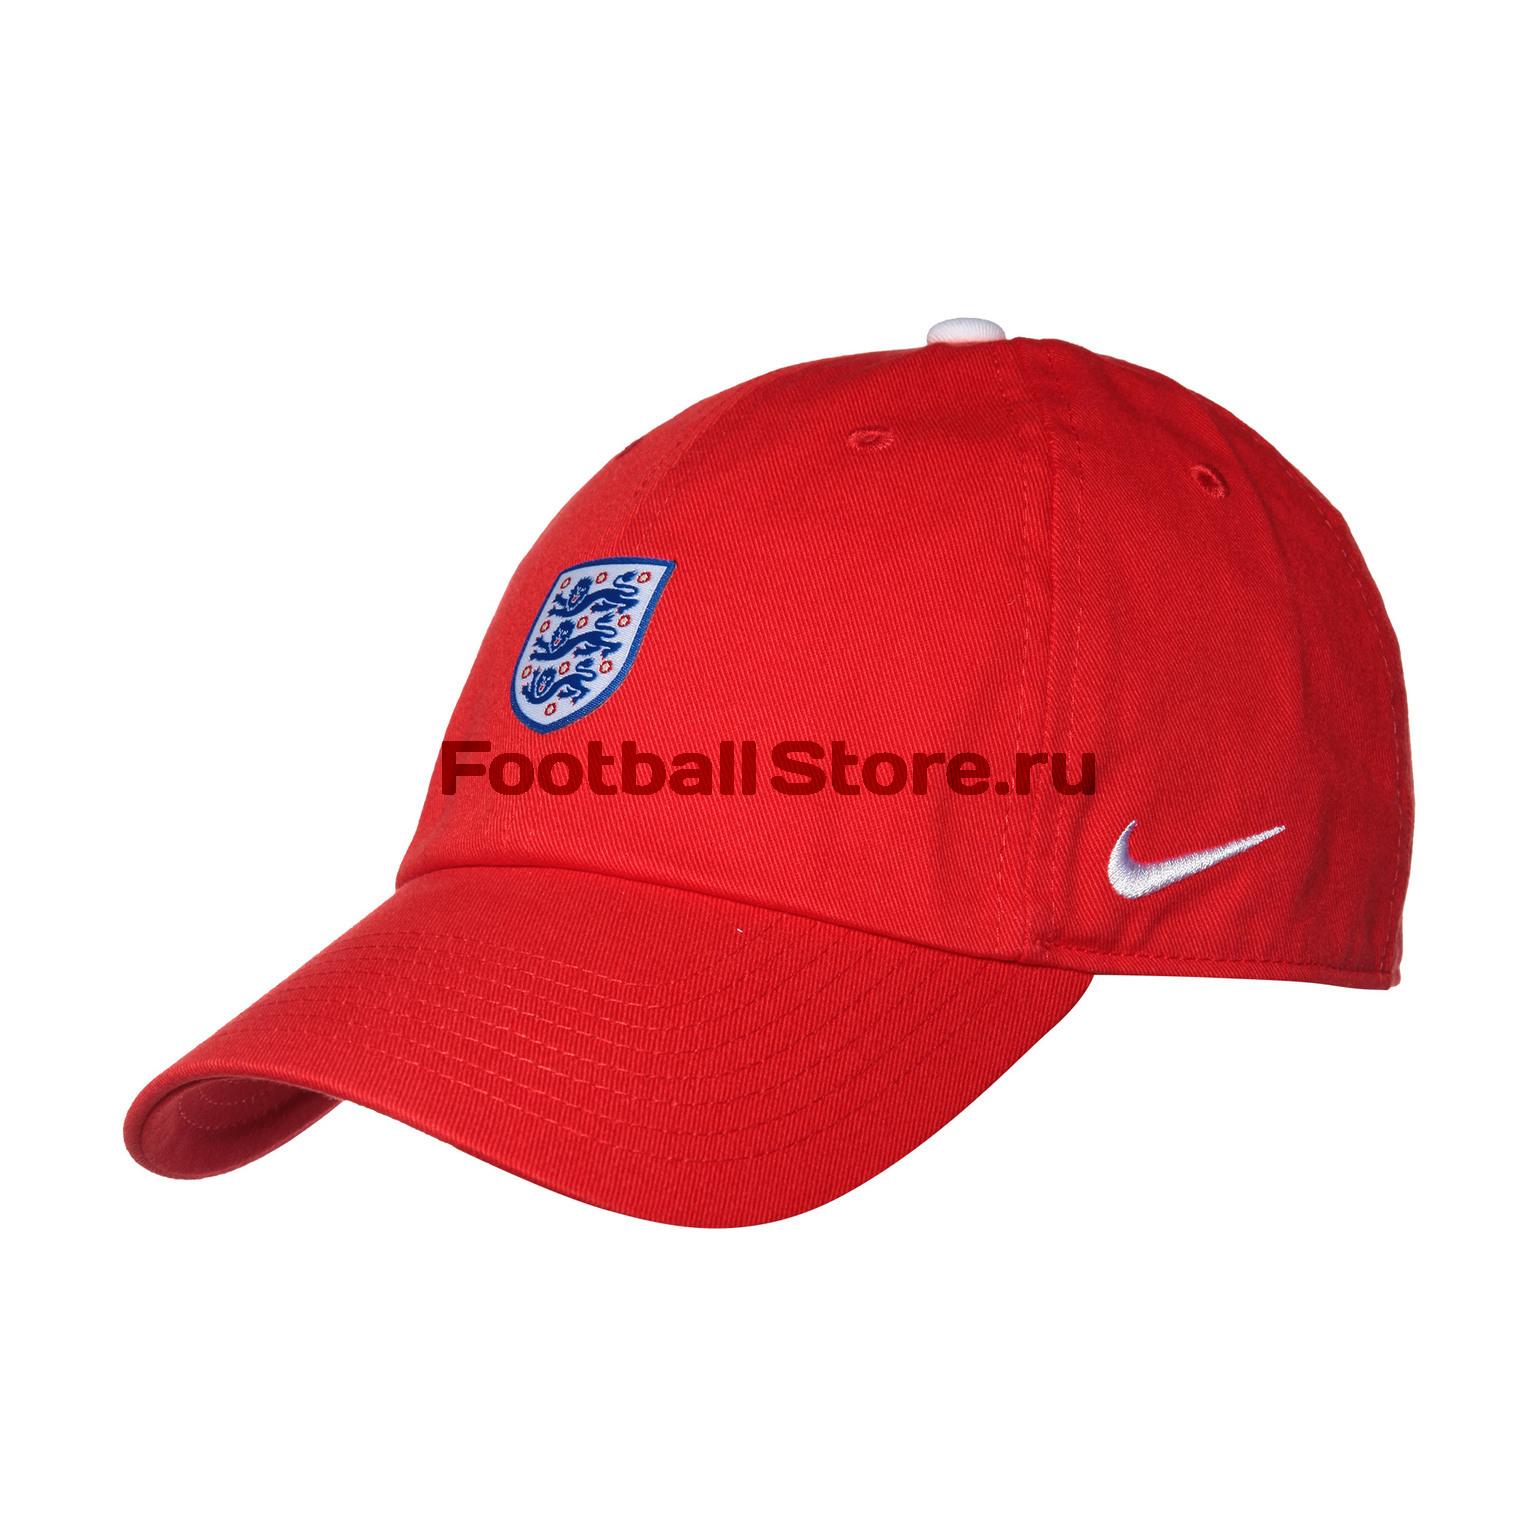 Бейсболка Nike England 881712-600 бейсболка nike run aw84 651659 413